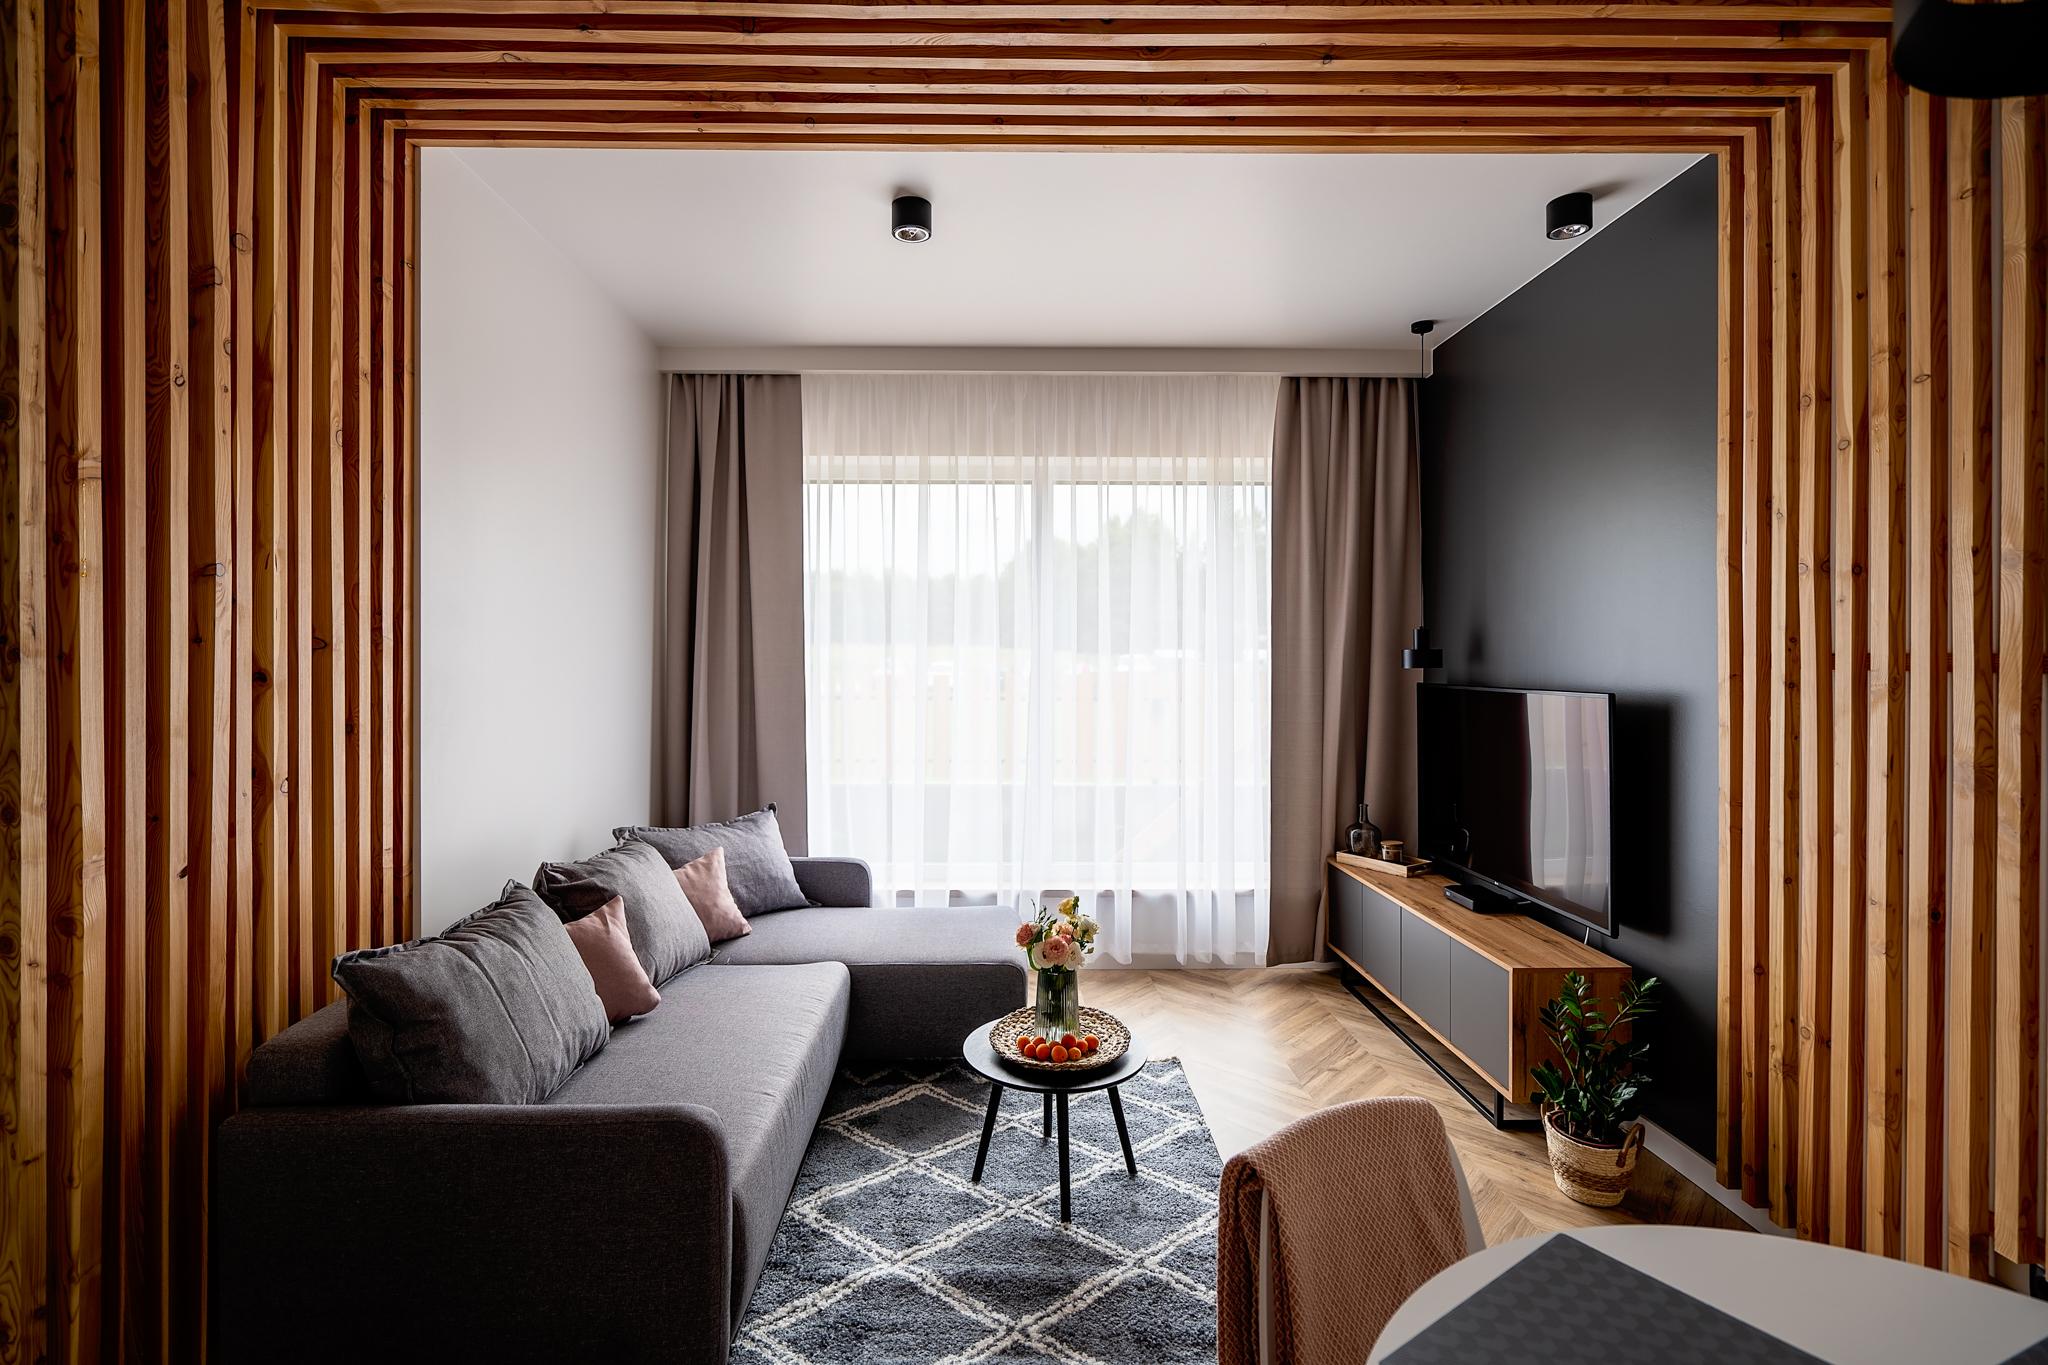 Apartamenty NOVA BIAŁKA Białka Tatrzańska apartament 2 salon